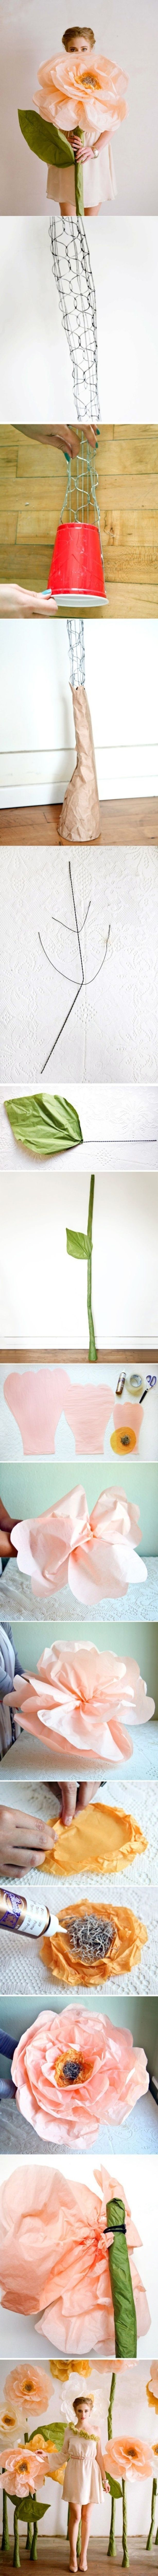 How to make a big flower